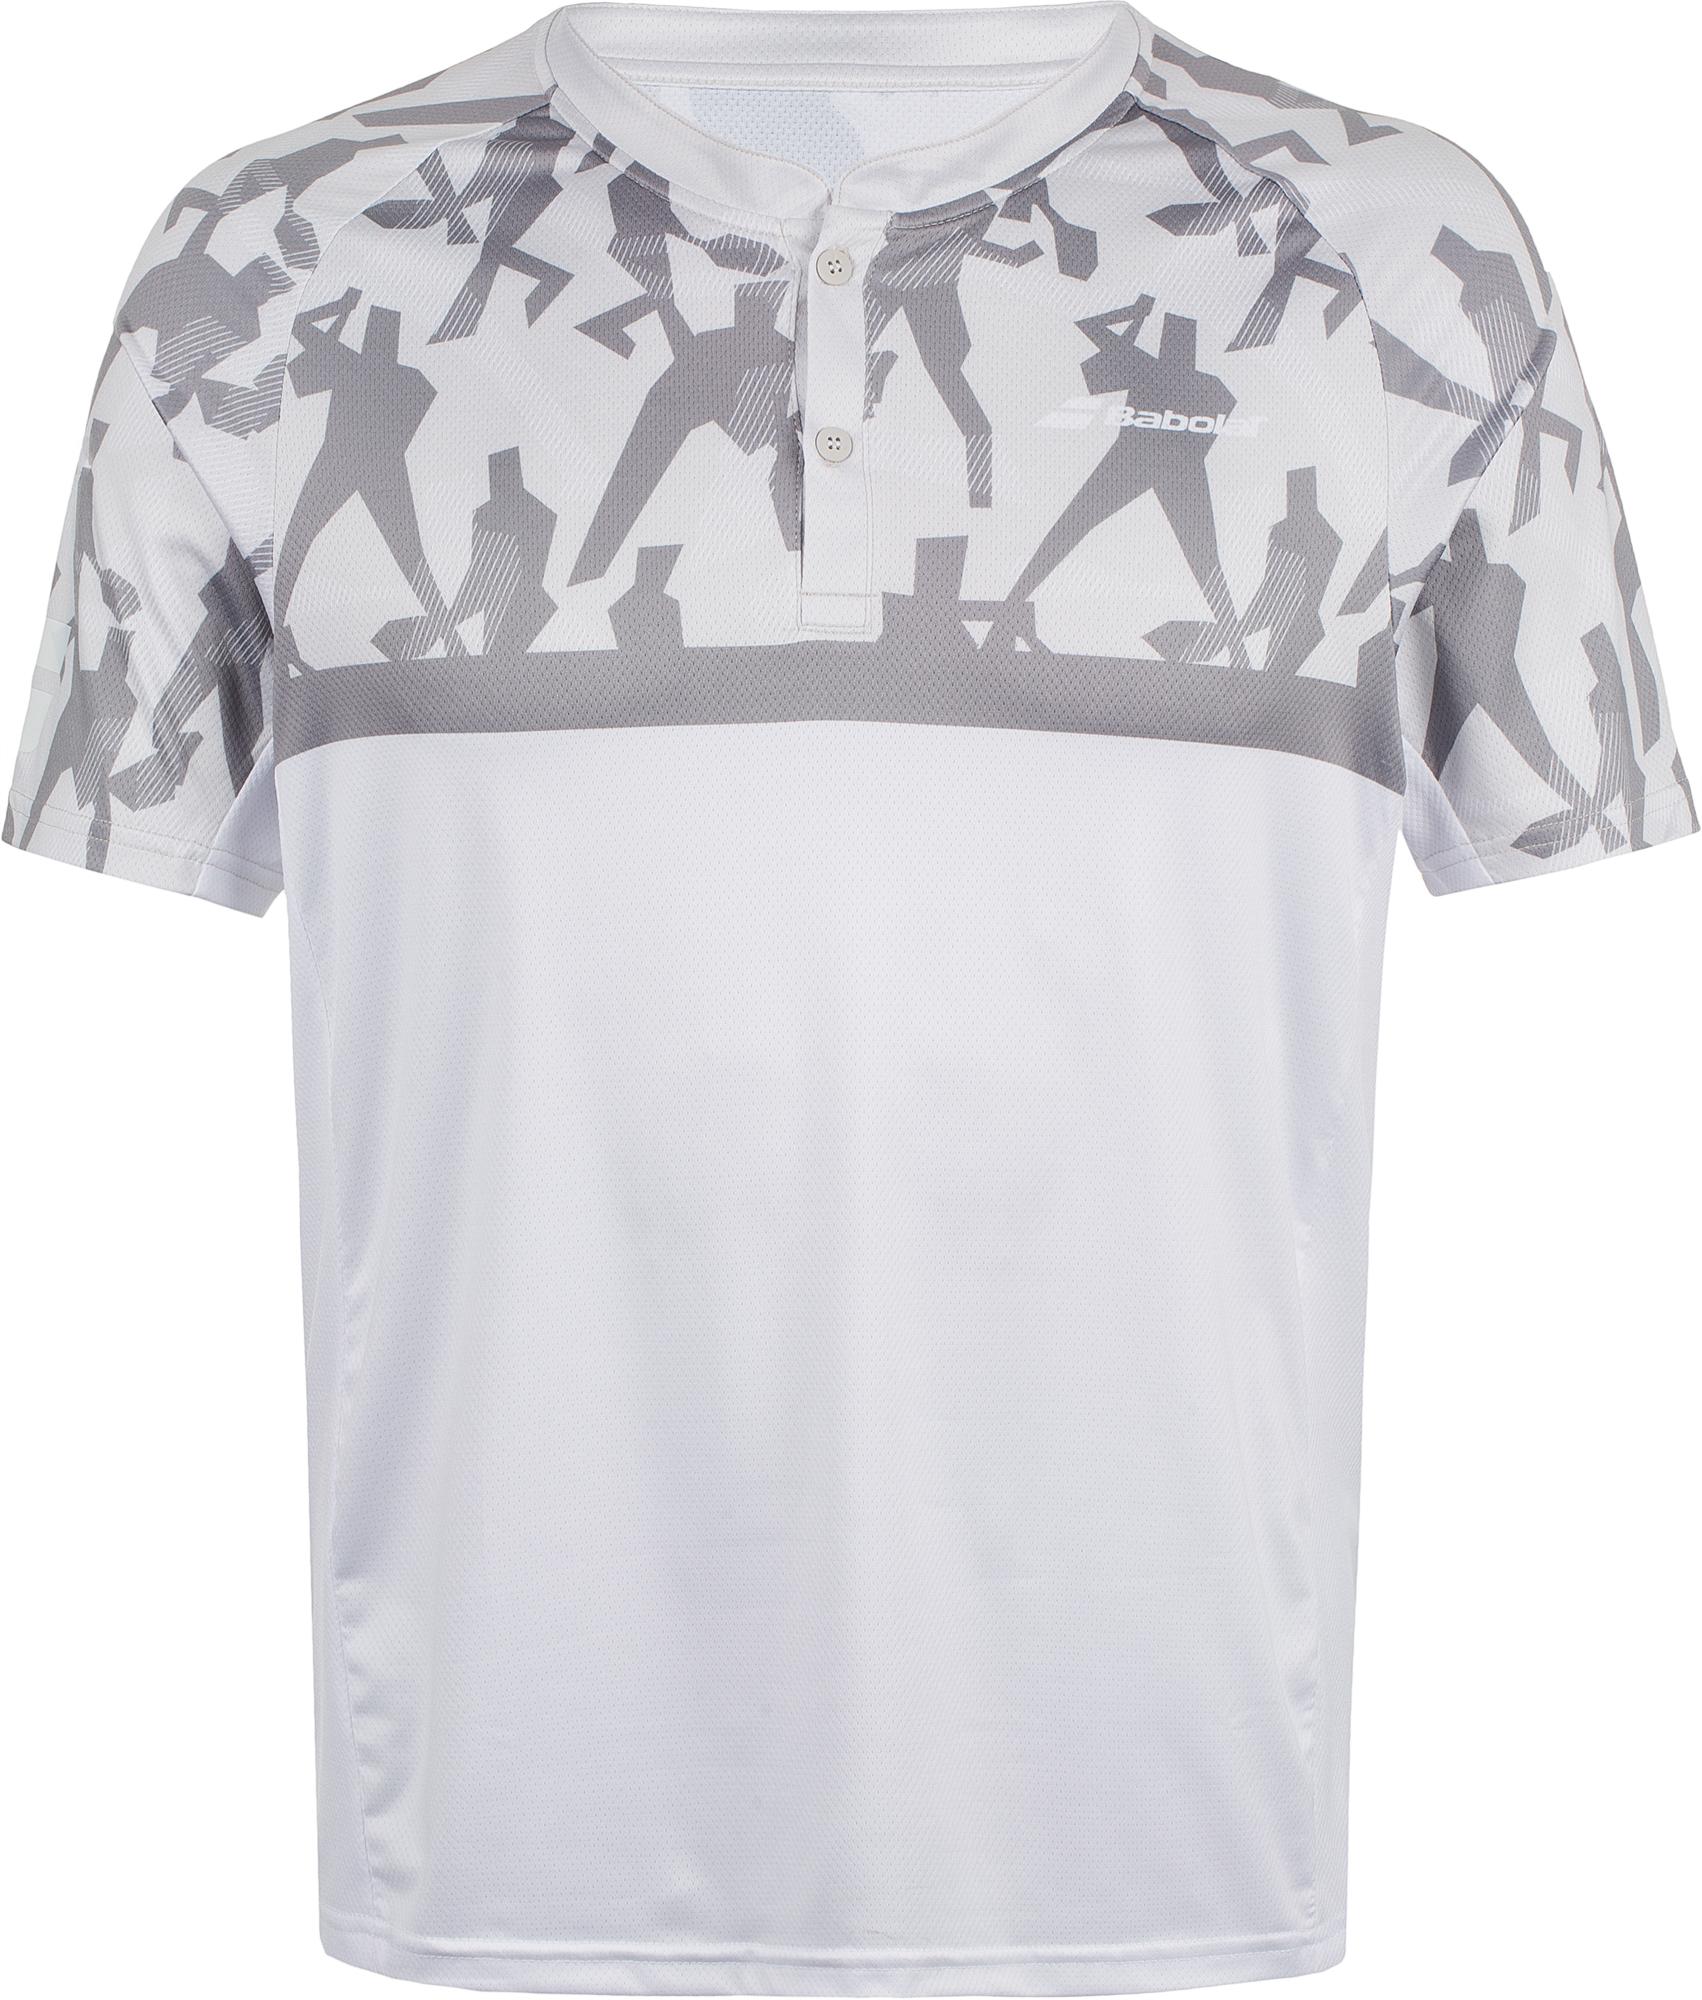 Babolat Поло мужское Babolat Complete, размер 50 babolat футболка женская babolat complete cap размер 42 44